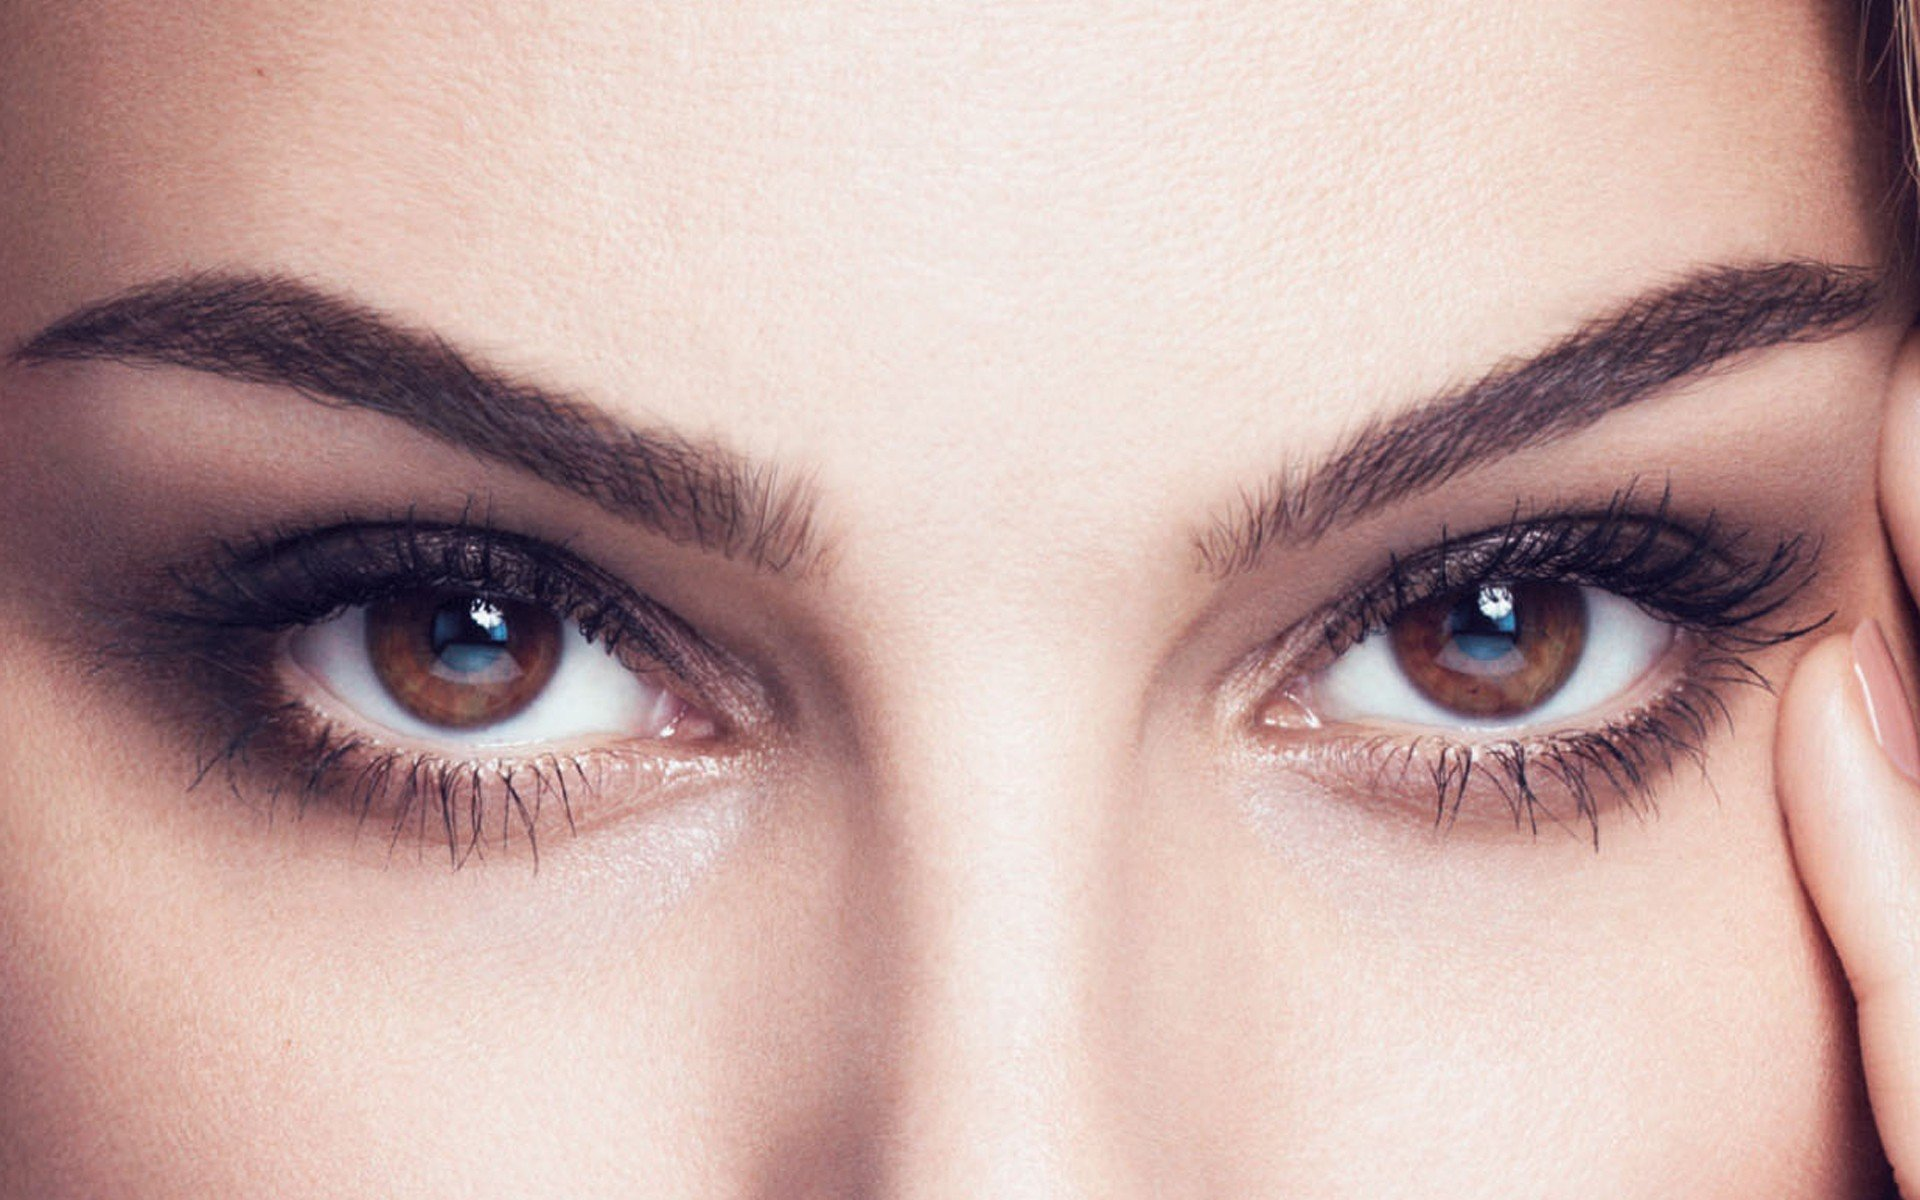 Днем, картинки про красивые глаза девушки